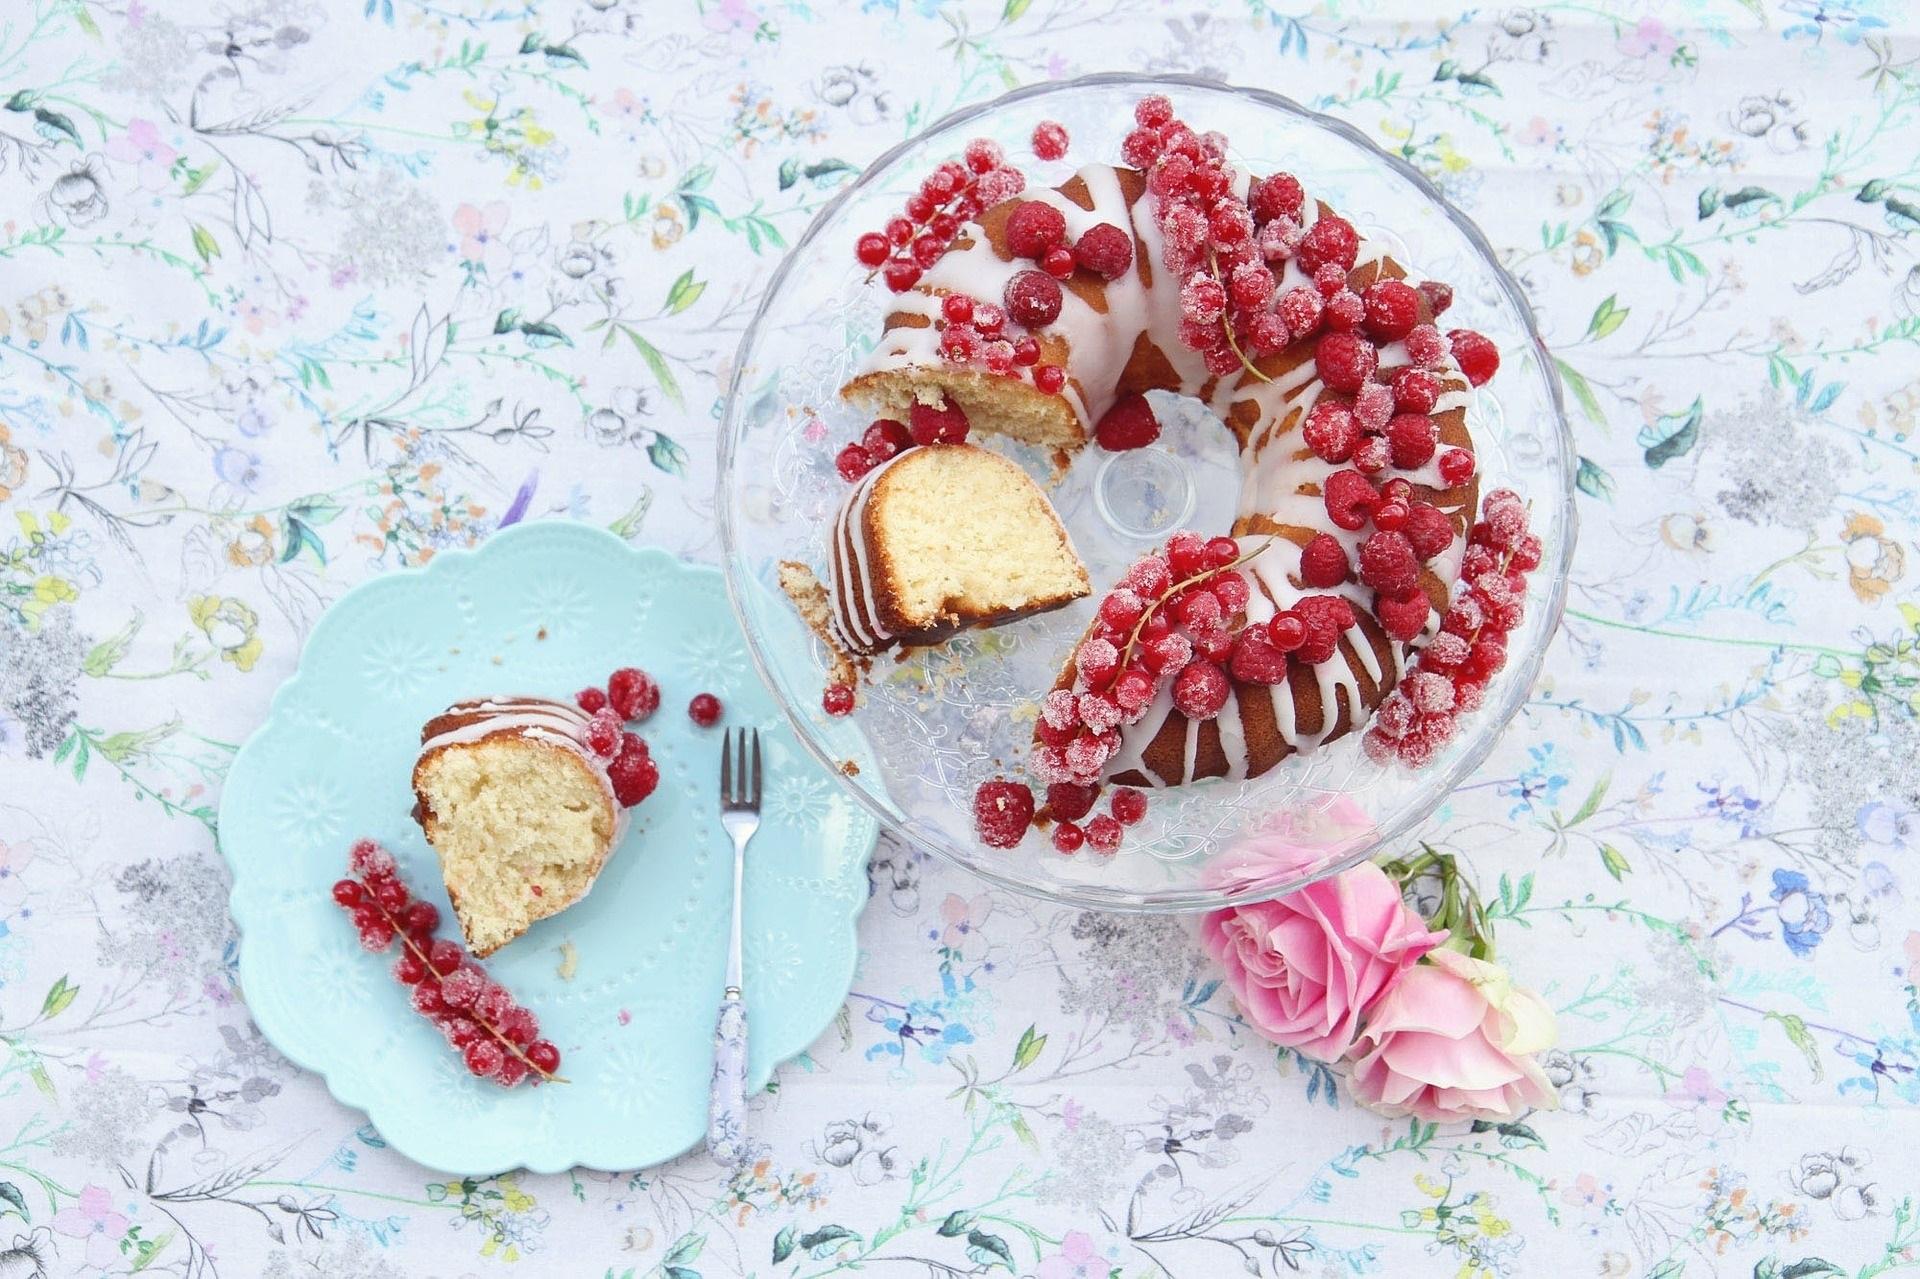 torta con uva spina